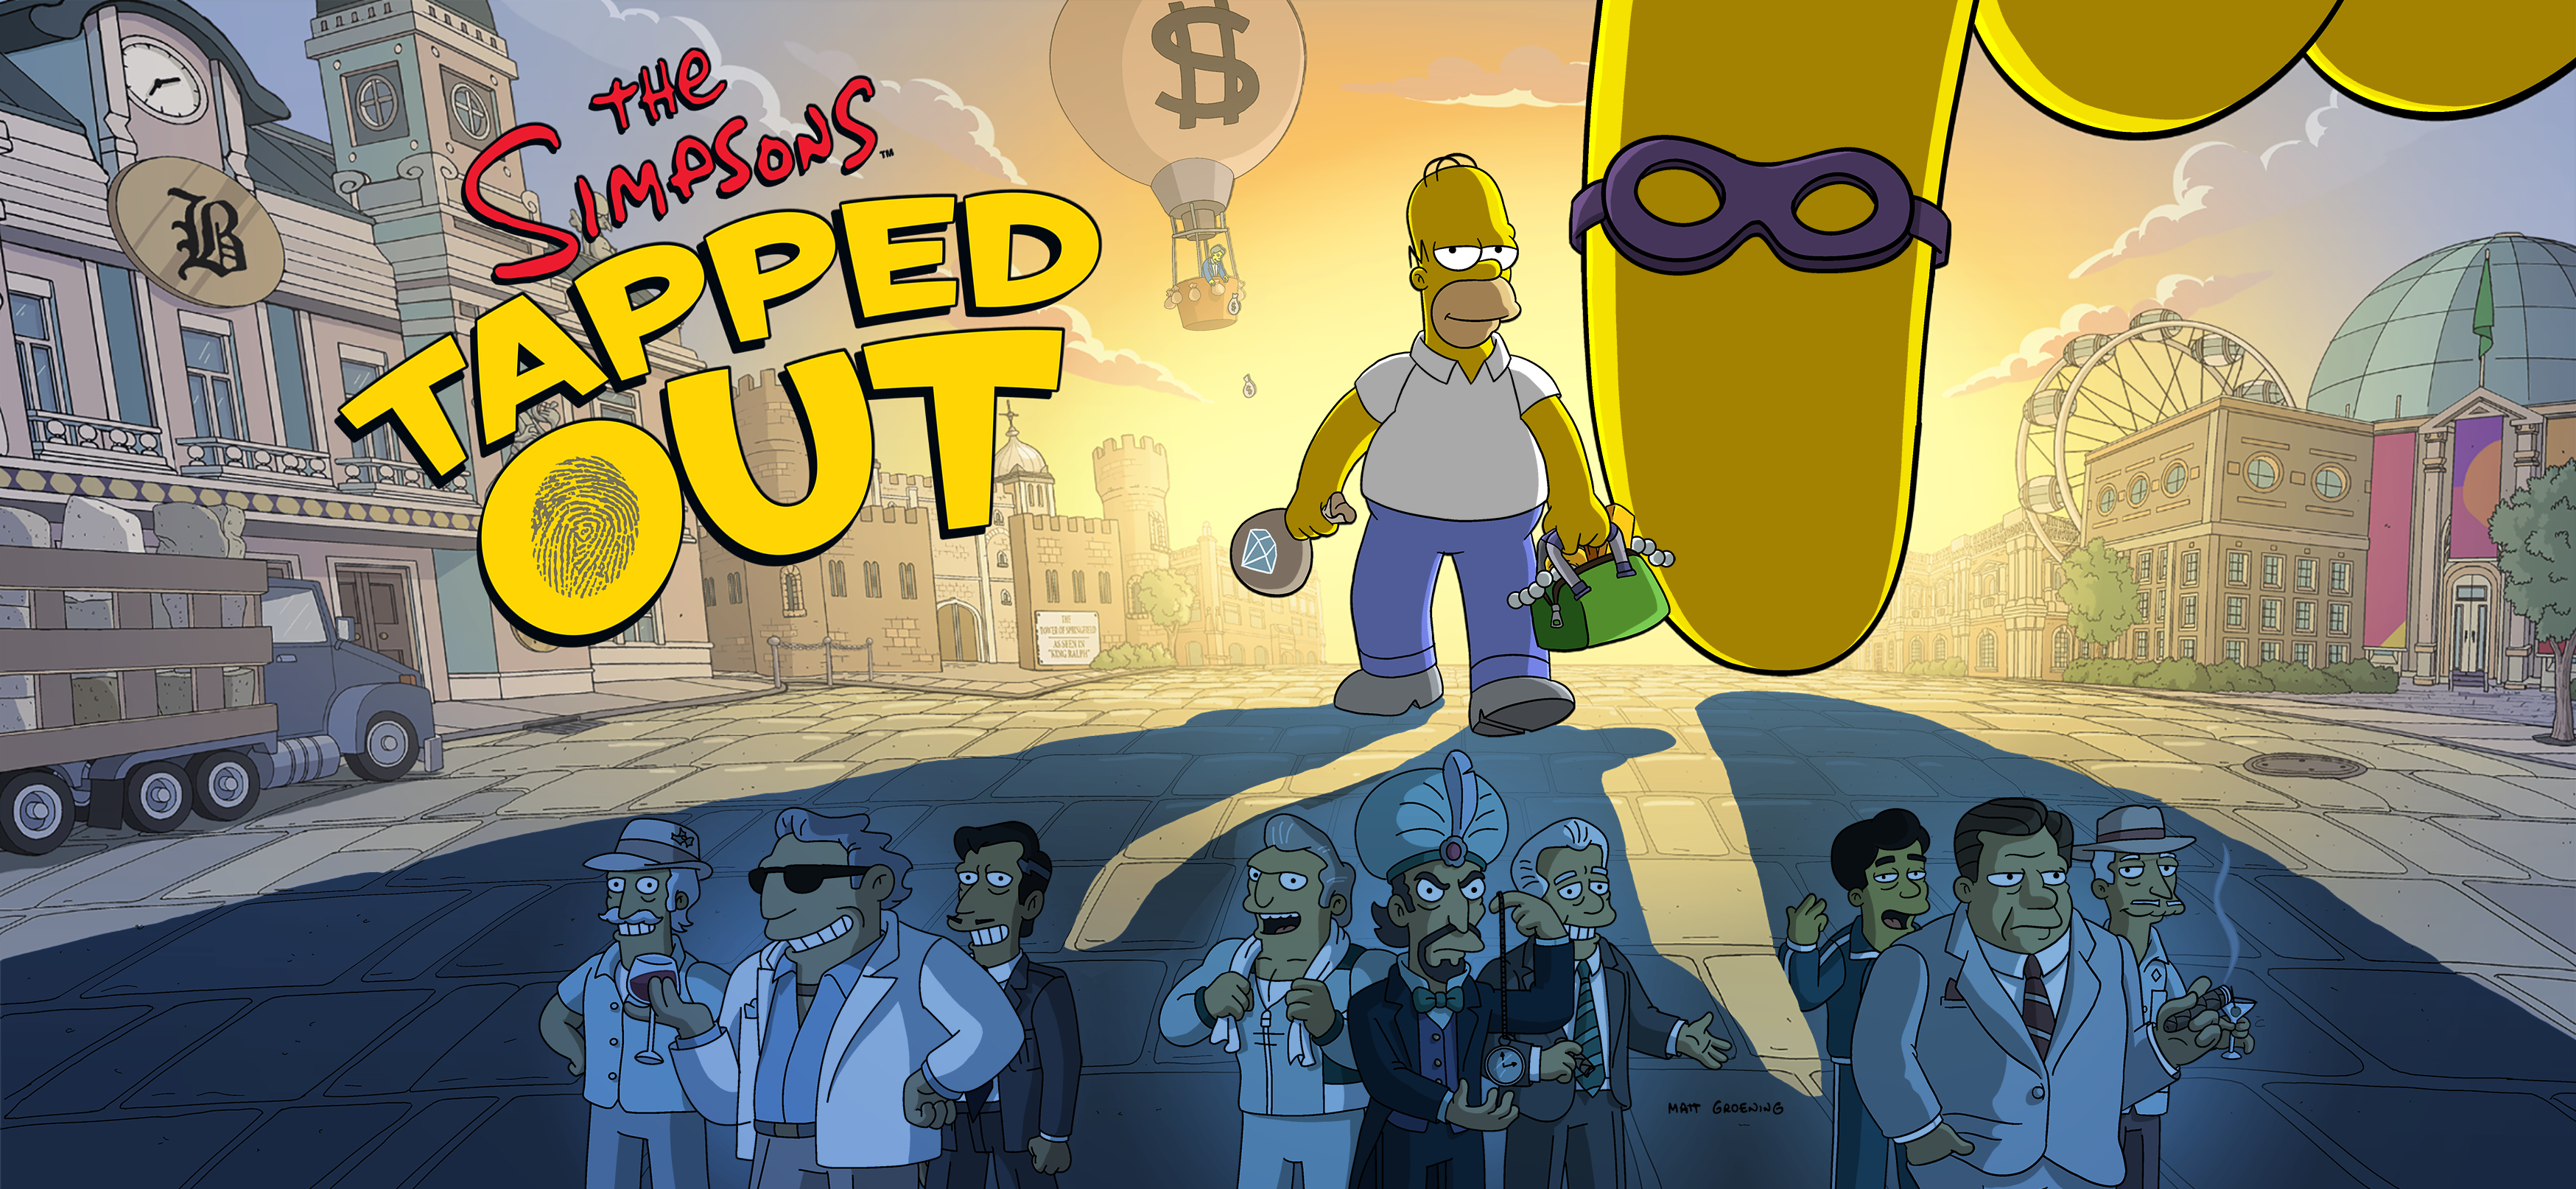 The_Springfield_Jobs_Splash_Screen.png